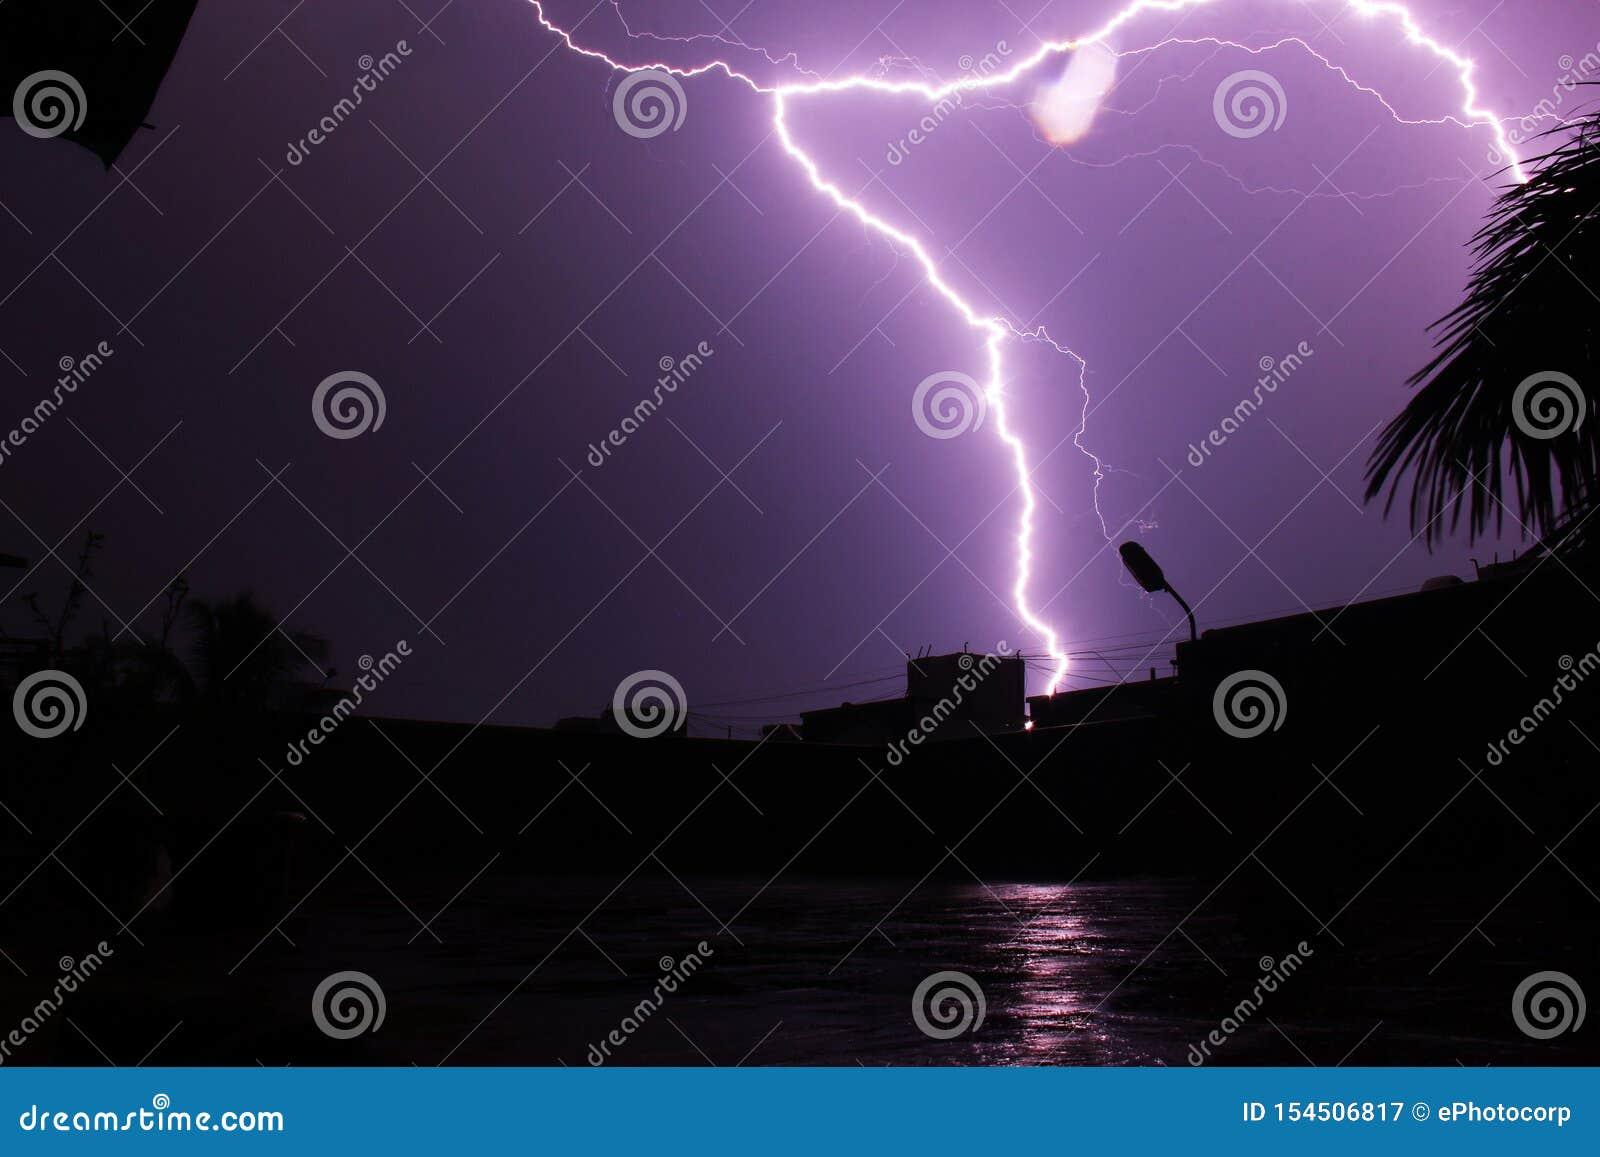 Lightning hitting building top at Pune, India